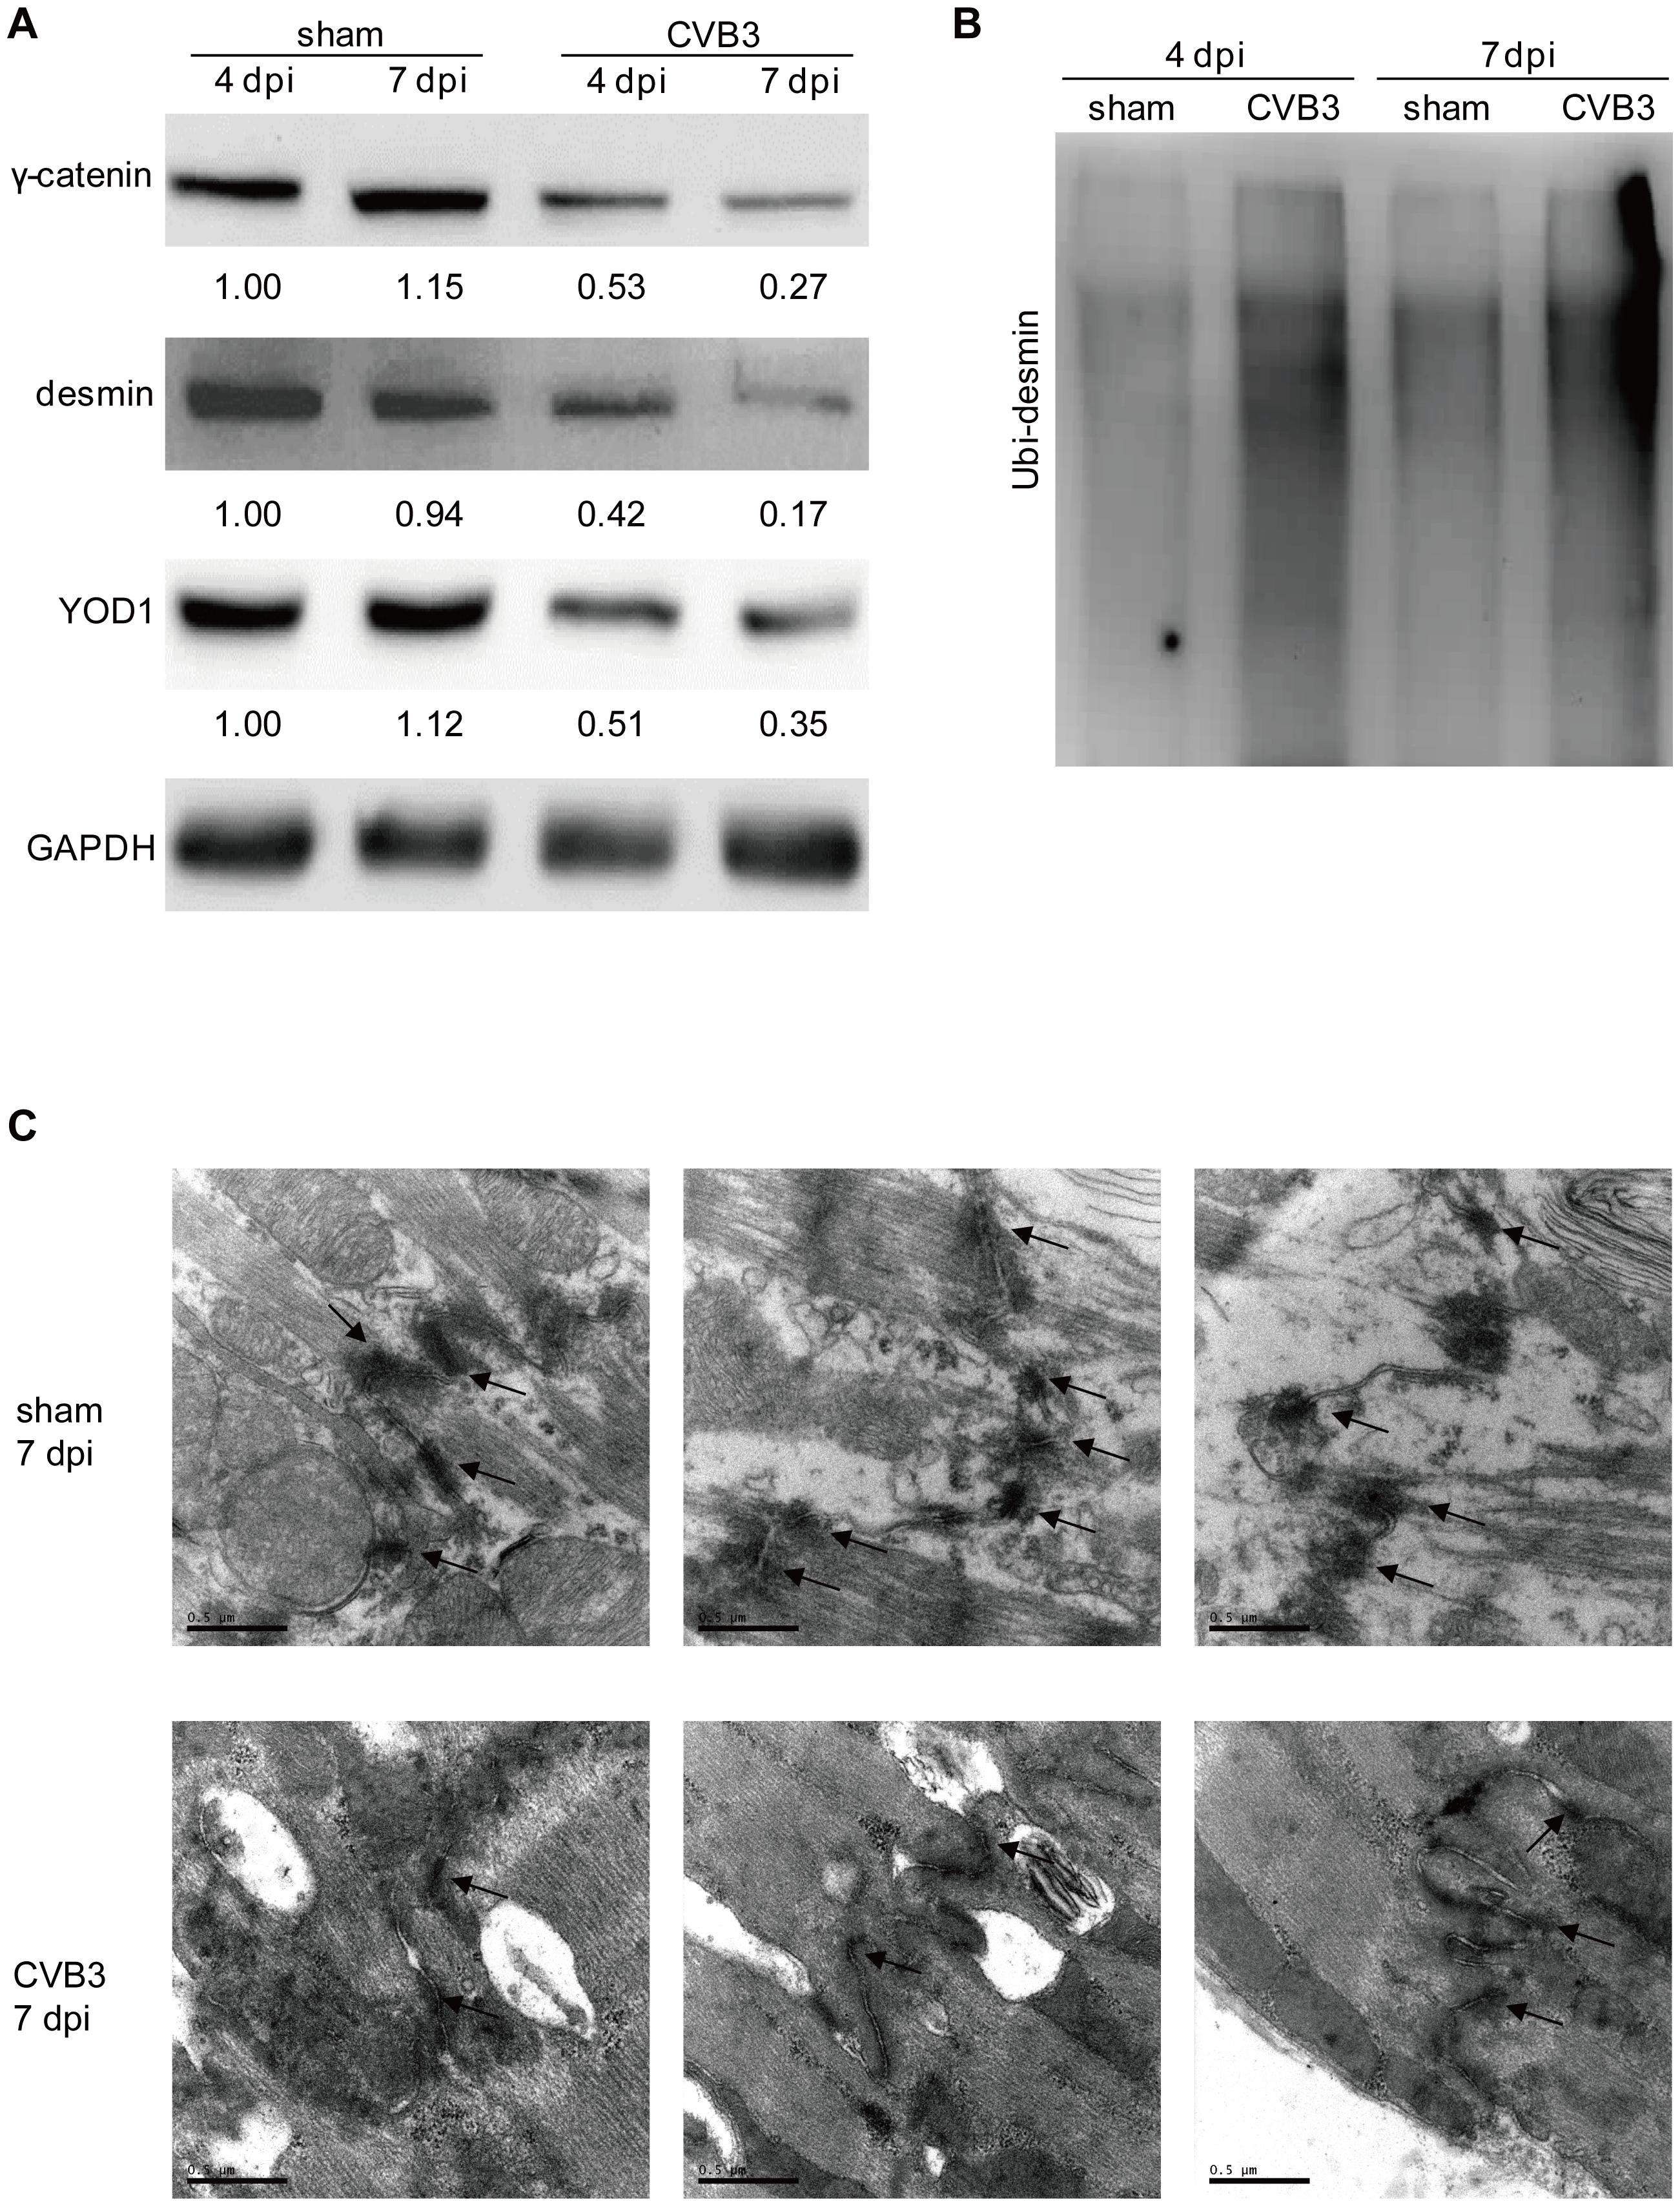 CVB3 infection disrupts desmosomes <i>in vivo</i>.